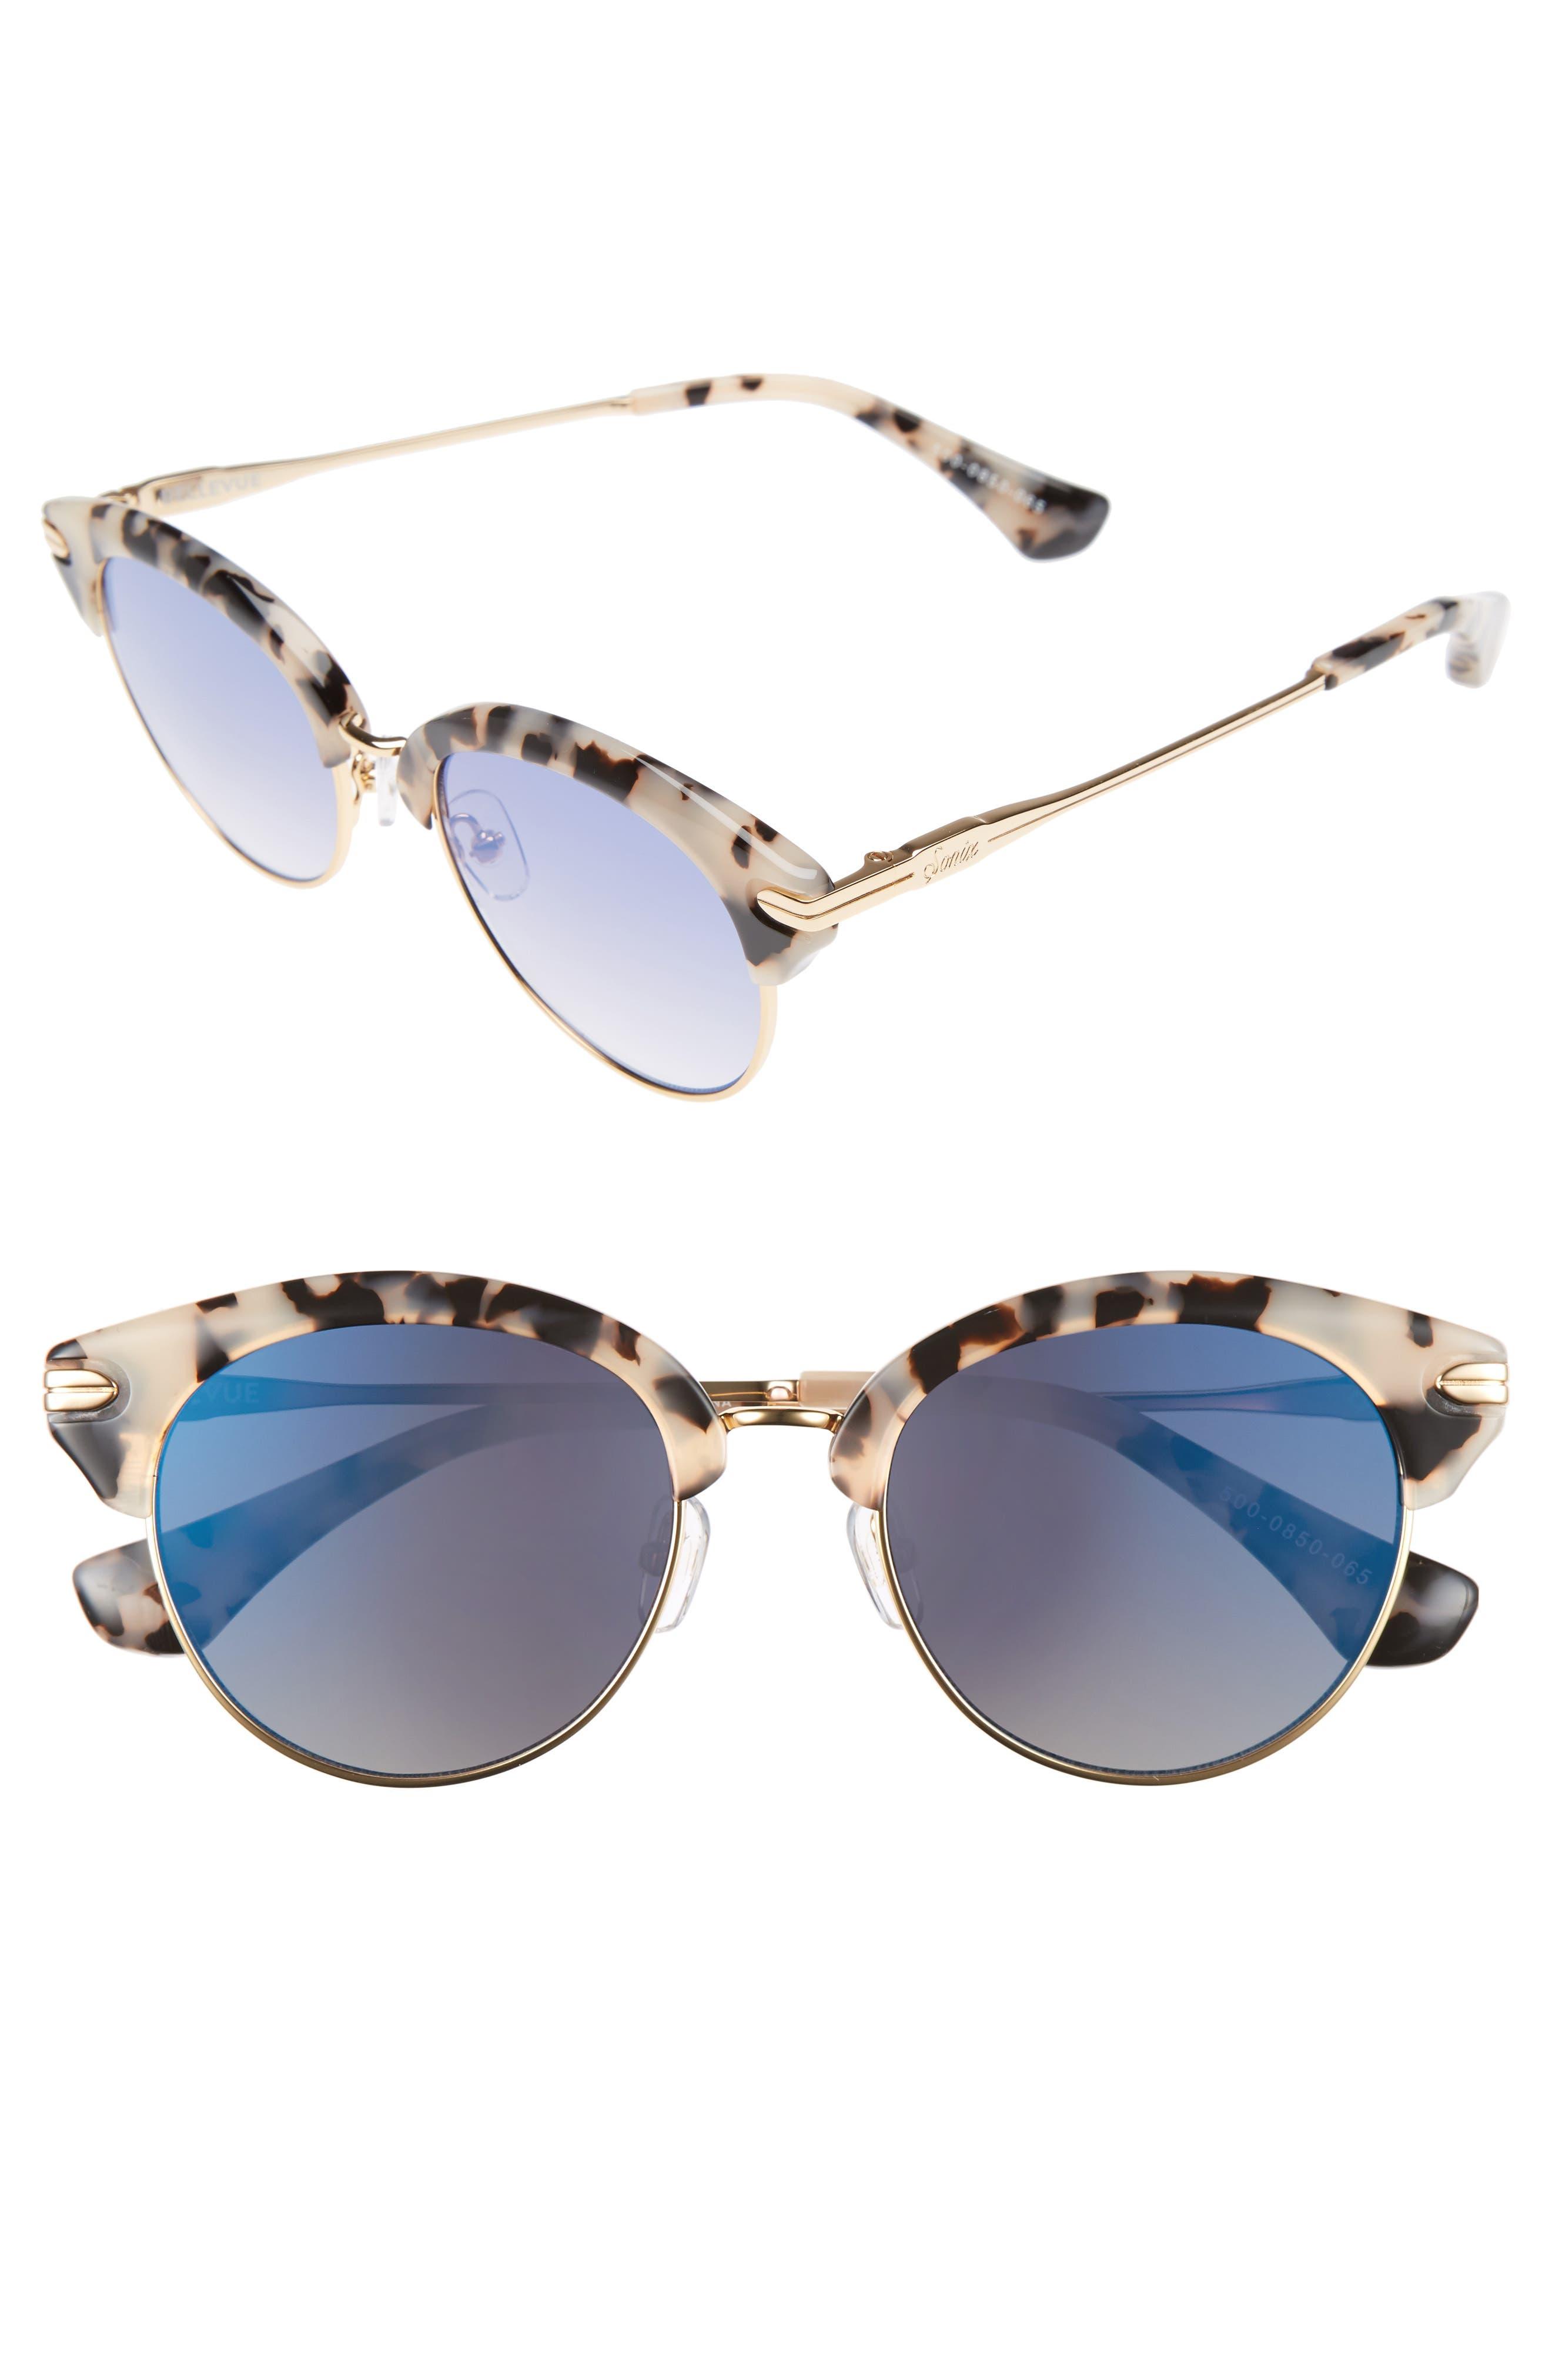 Bellevue 50mm Mirrored Sunglasses,                         Main,                         color, 200